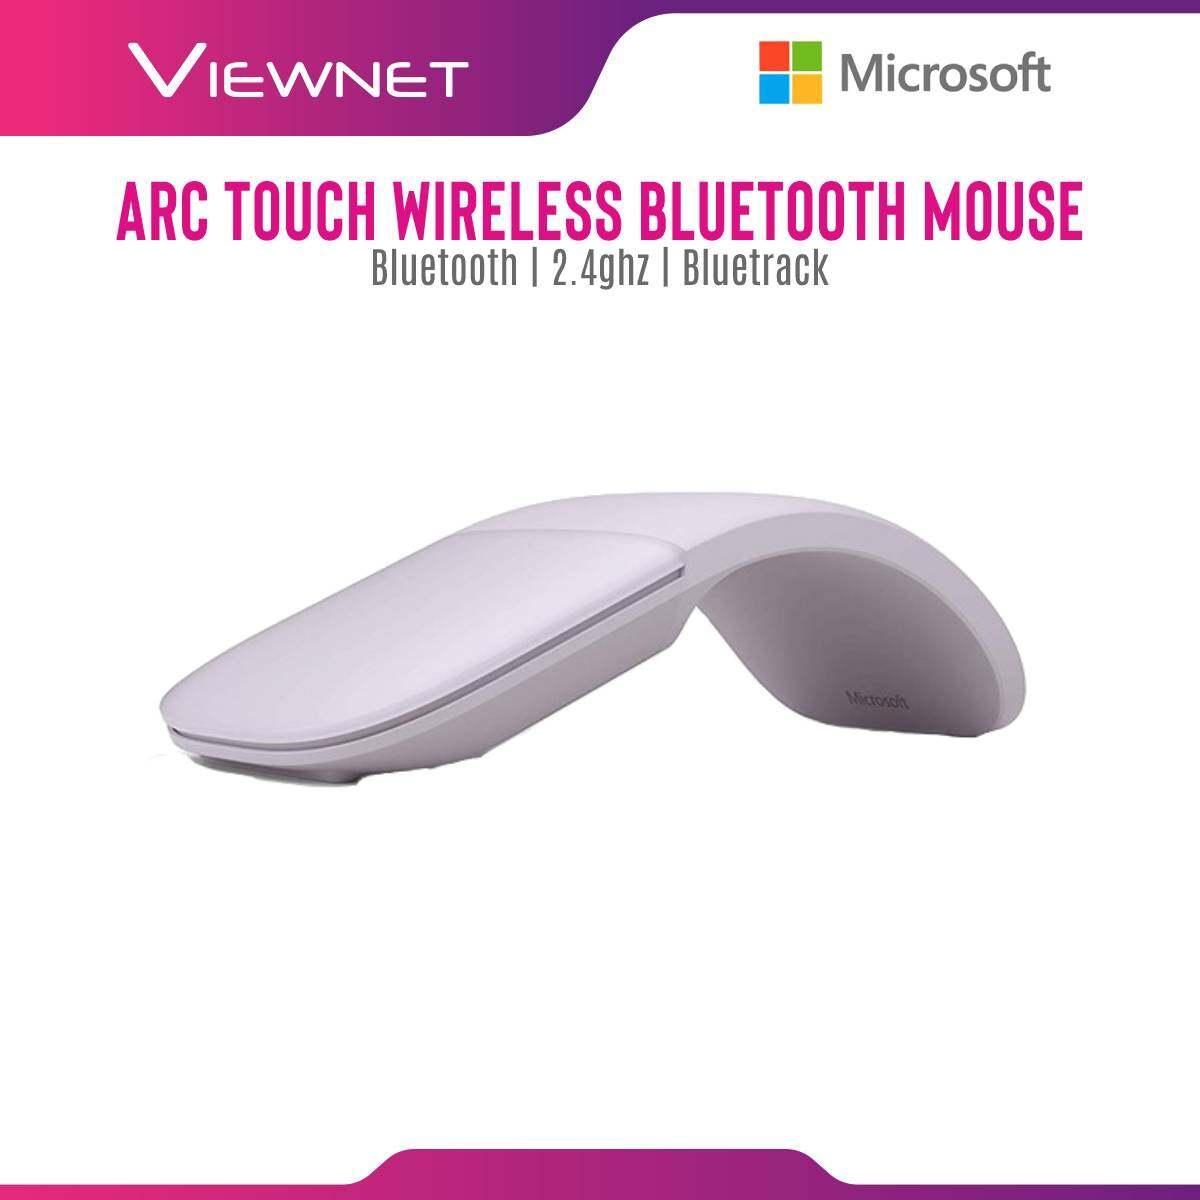 Microsoft Bluetooth Arc Touch Mouse (ELG-00005) BLK , (ELG-00022) LILAC , (ELG-00031) SOFT PINK , (ELG-00044) SAGE